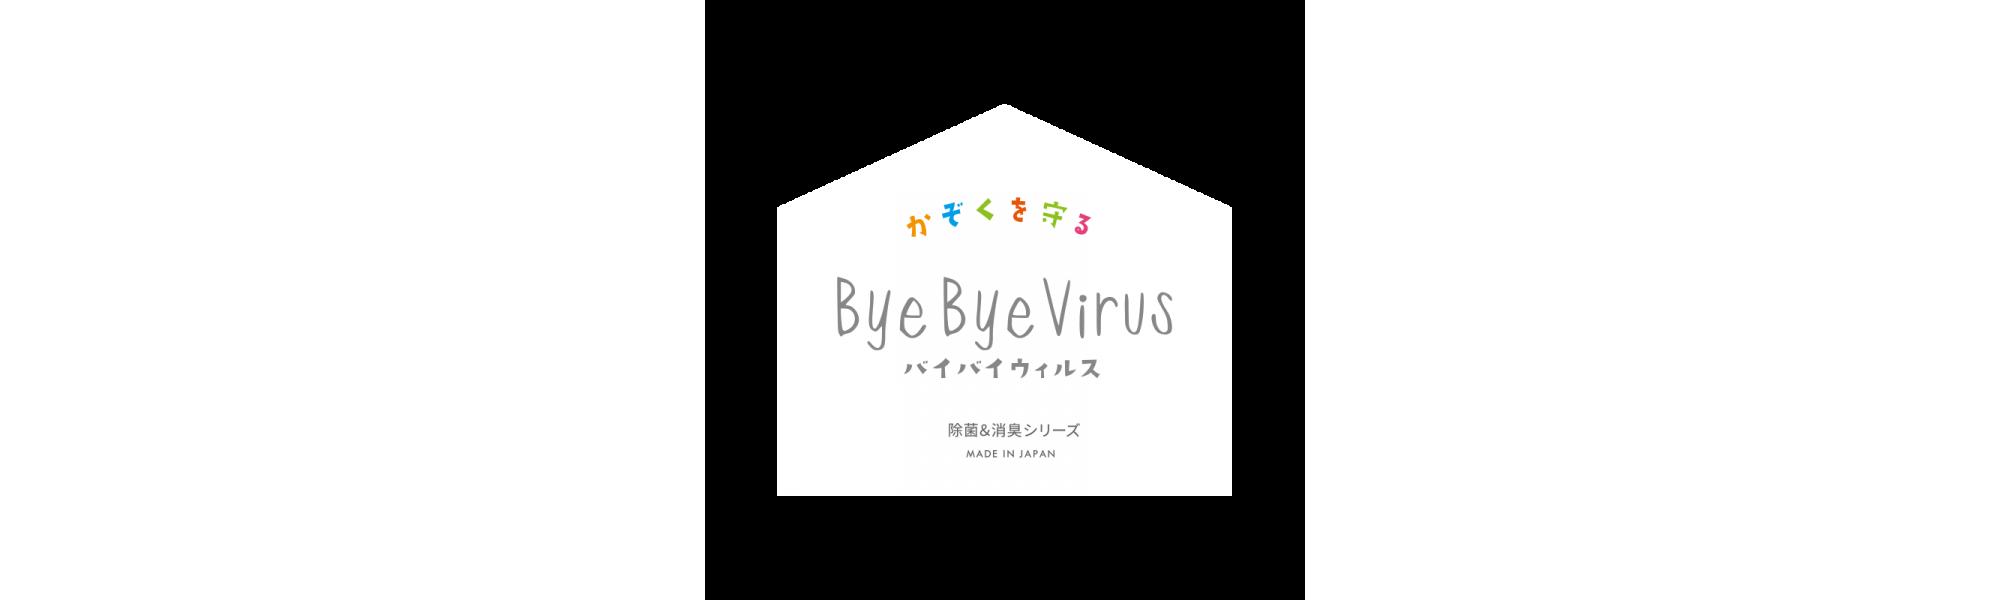 byebyevirus